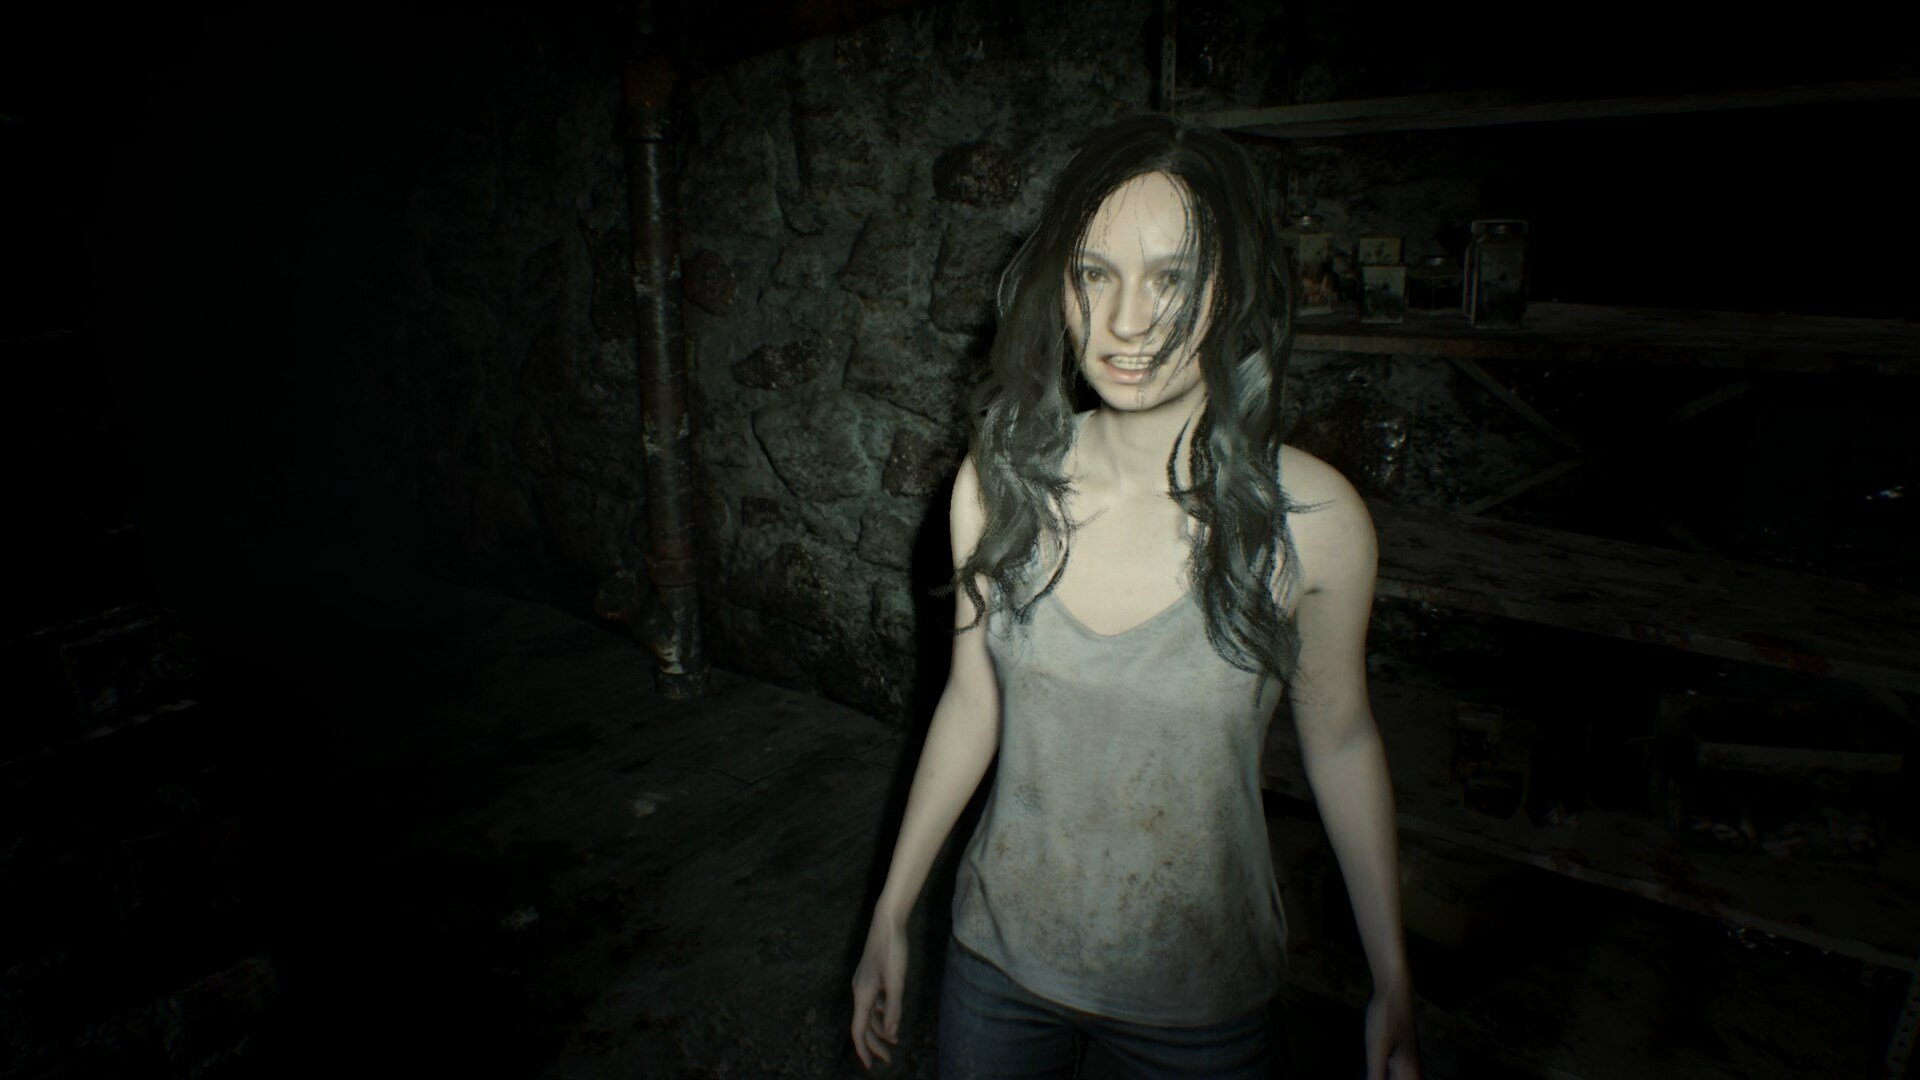 Resident evil 7 biohazard porn